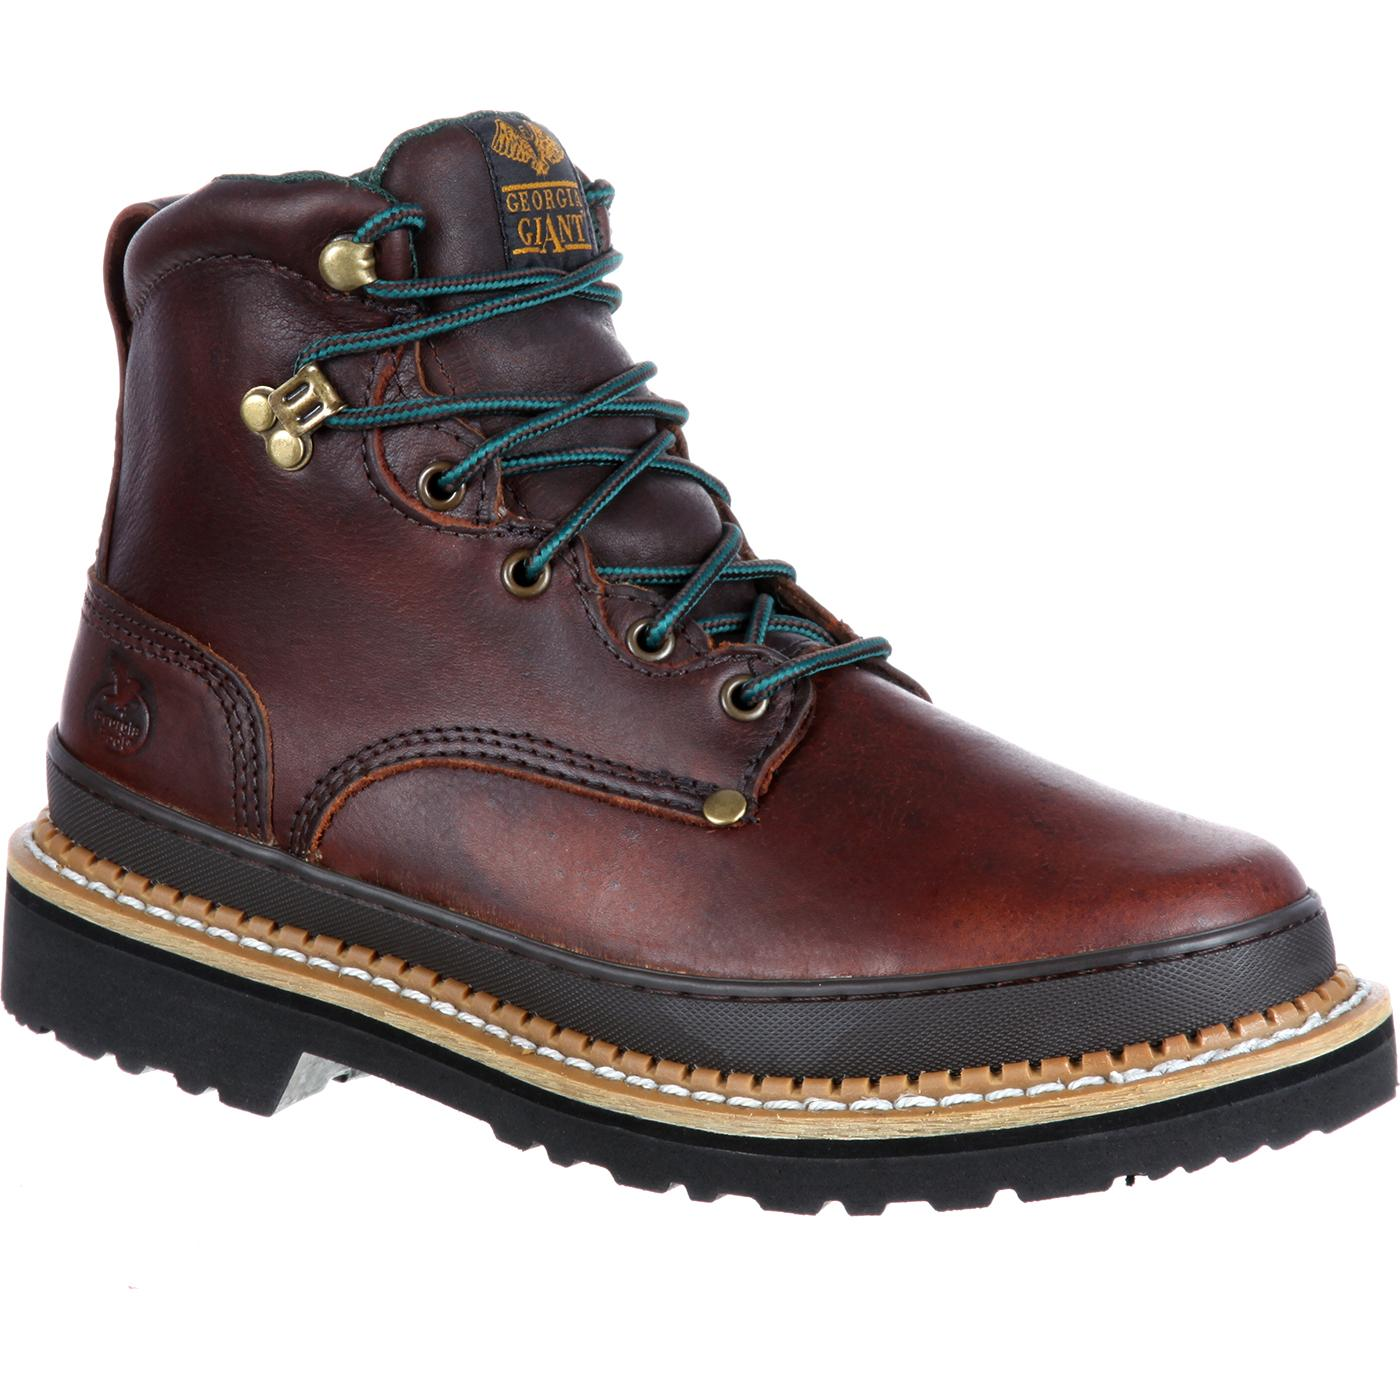 1daed745036 Georgia Giant Work Boot